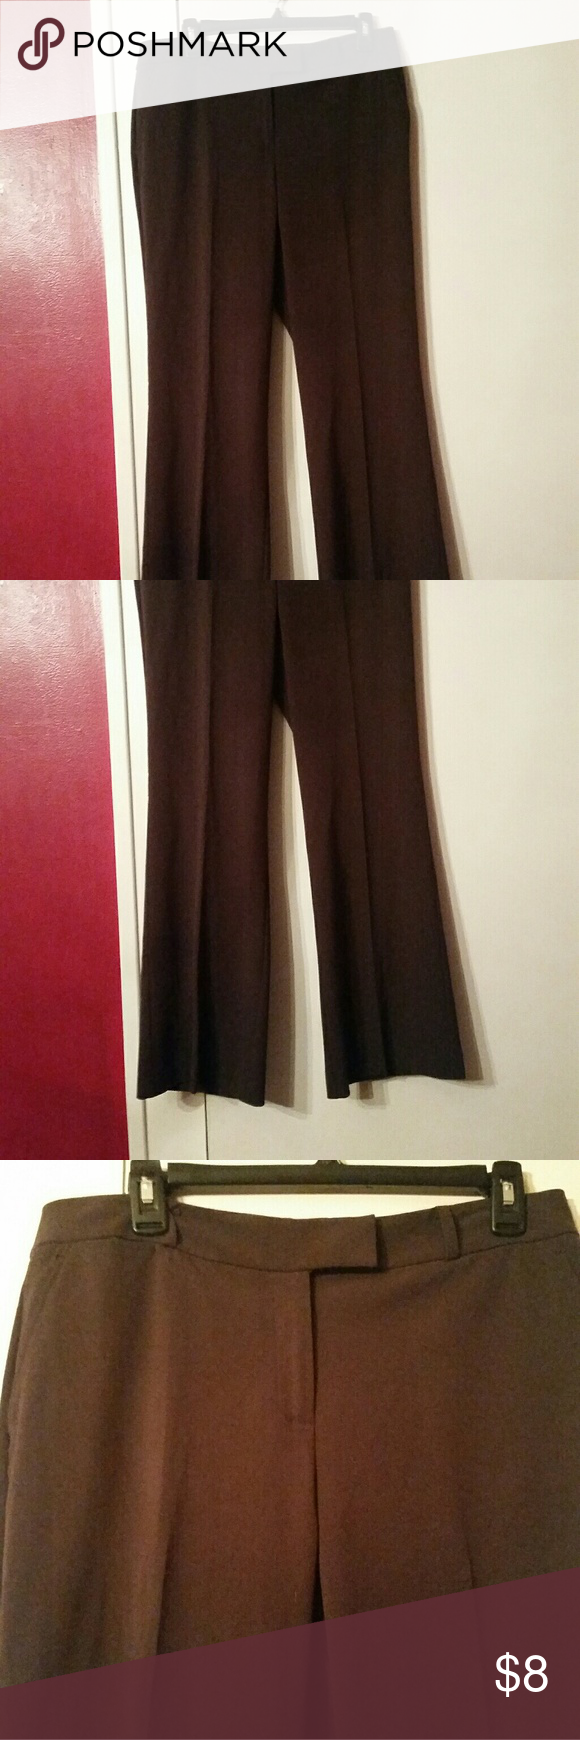 Nyuco dress pant dress pants dark brown and size